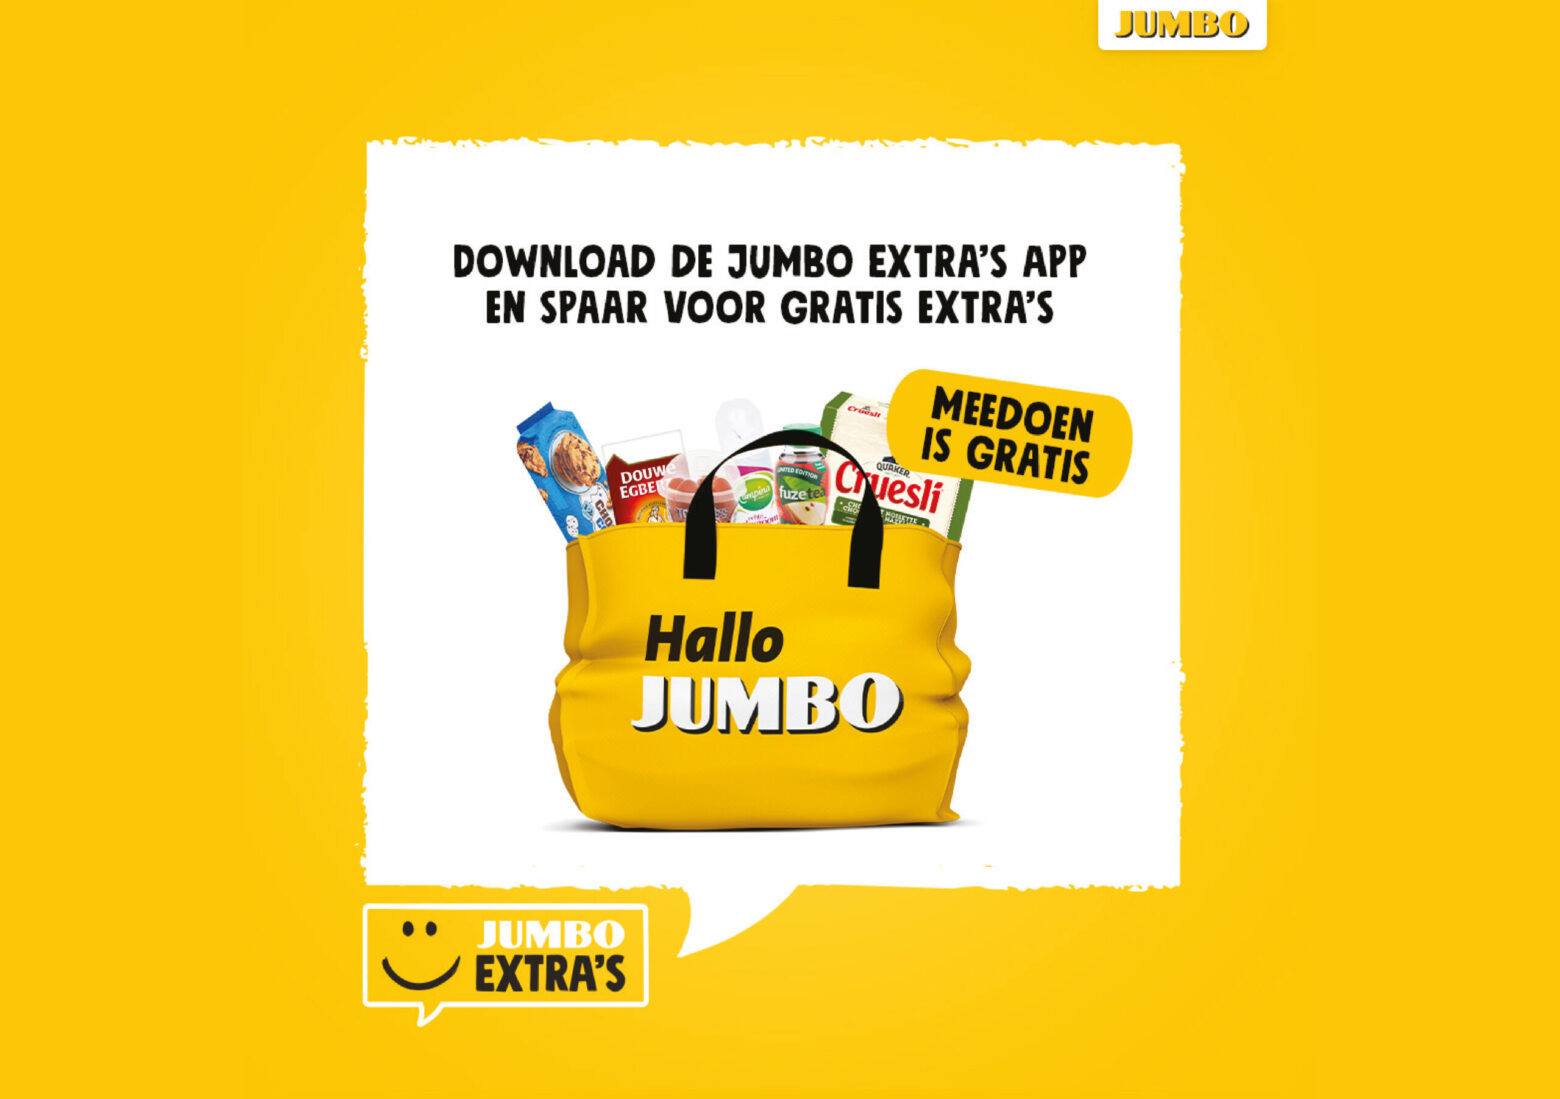 Jumbo extra's